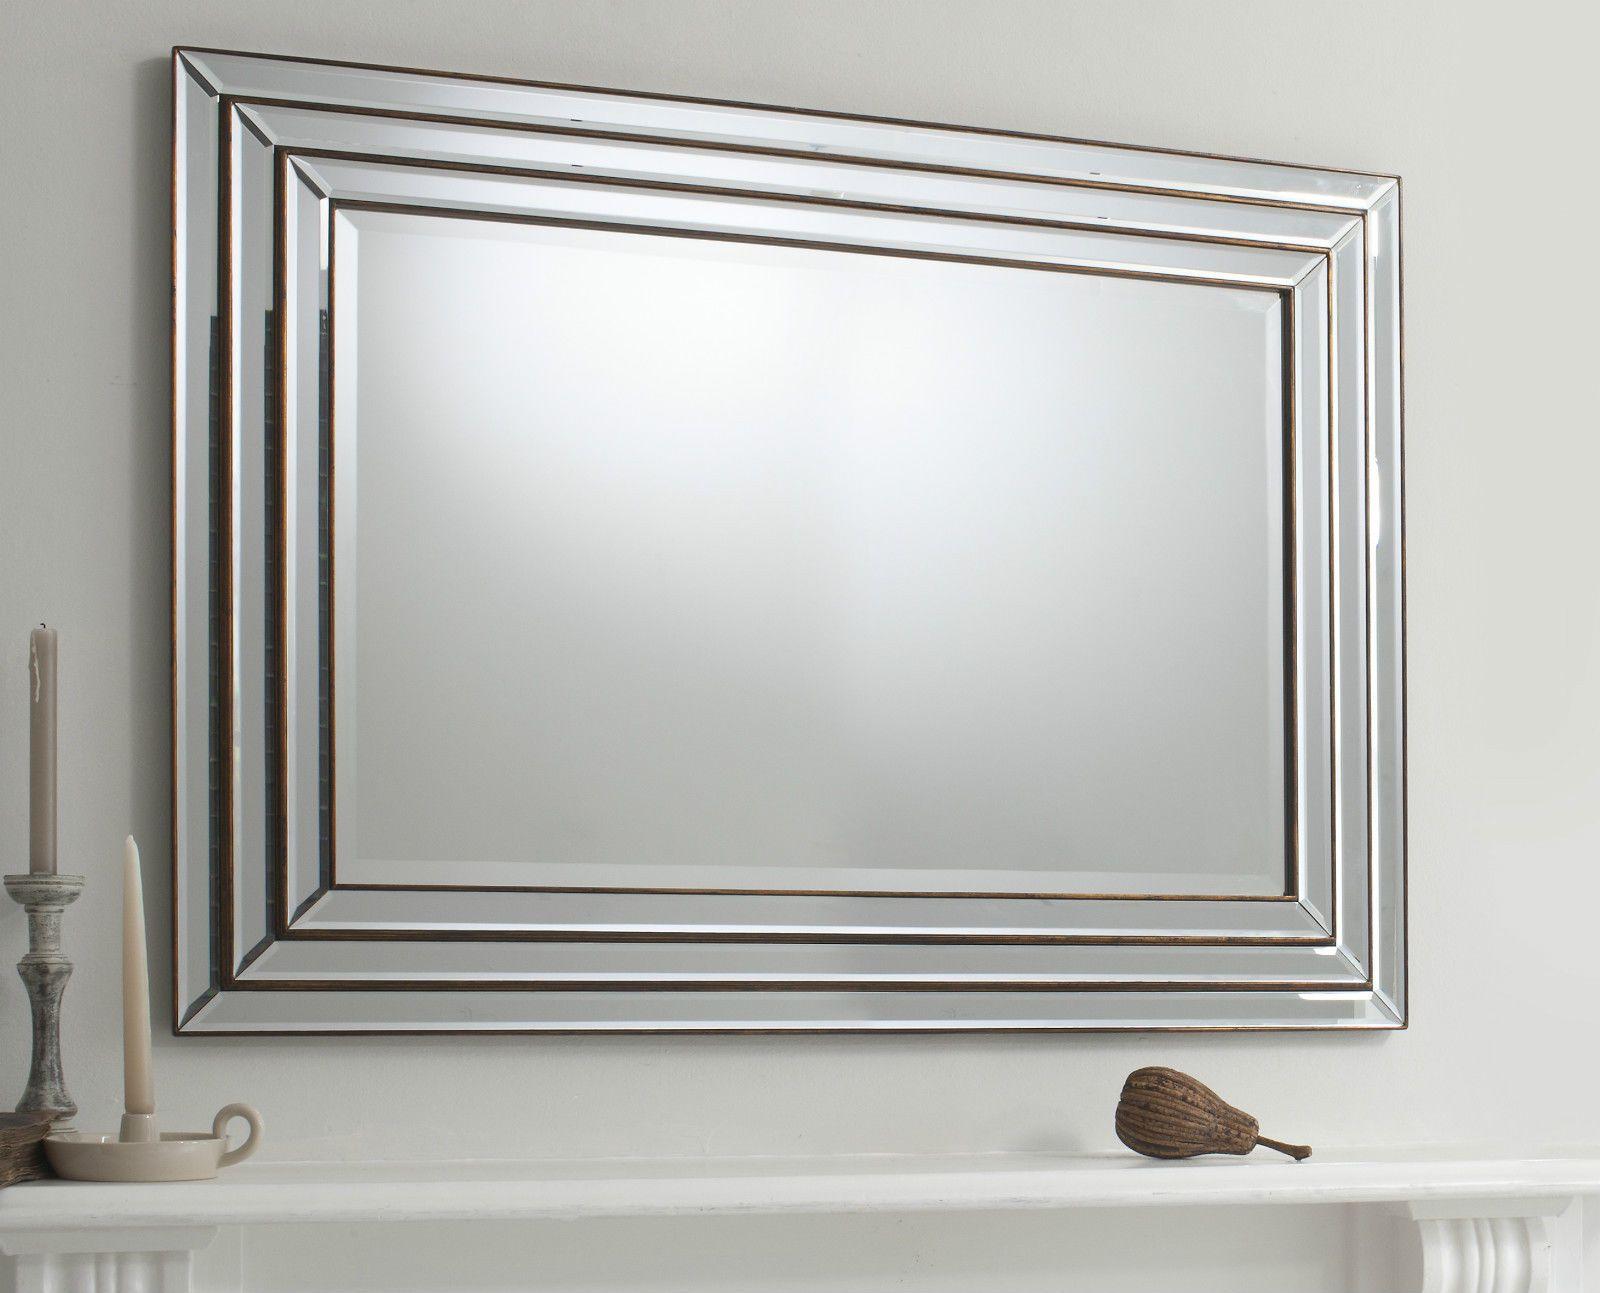 Dorable Silver Wall Frames Festooning - Frame Photo Design Ideas ...